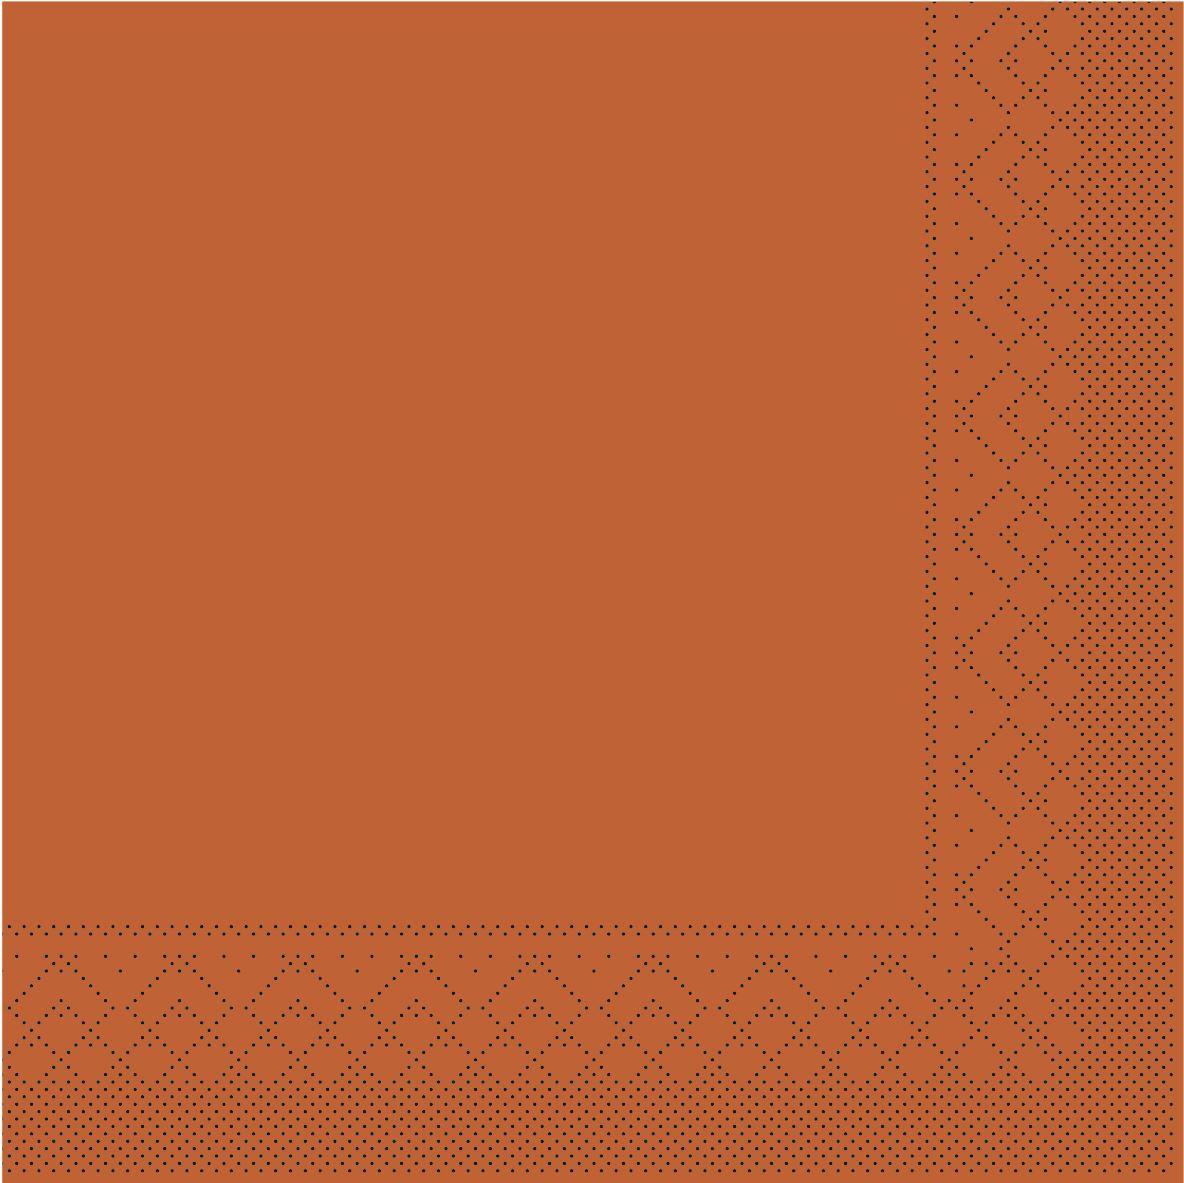 Serwetki chusteczki 33x33 cm - BASIC  TERRAKOTTA  33x33 cm 1/4 Falz